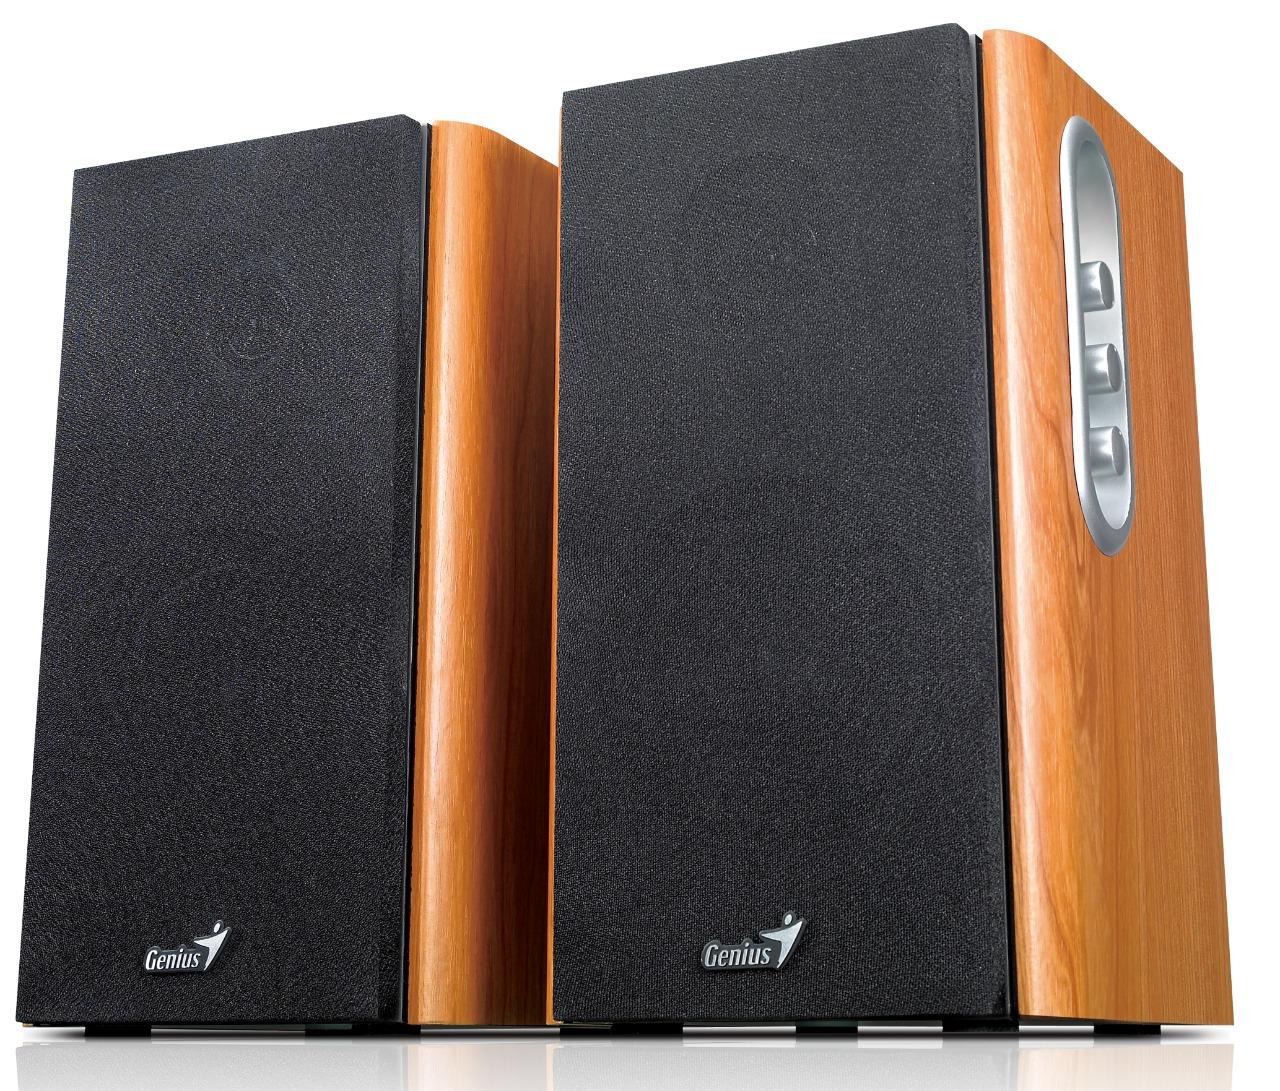 WHOLESALE SPEAKER : SP-HF2000A 230V EU - 60 watt Hi-Fi wood speakers_3